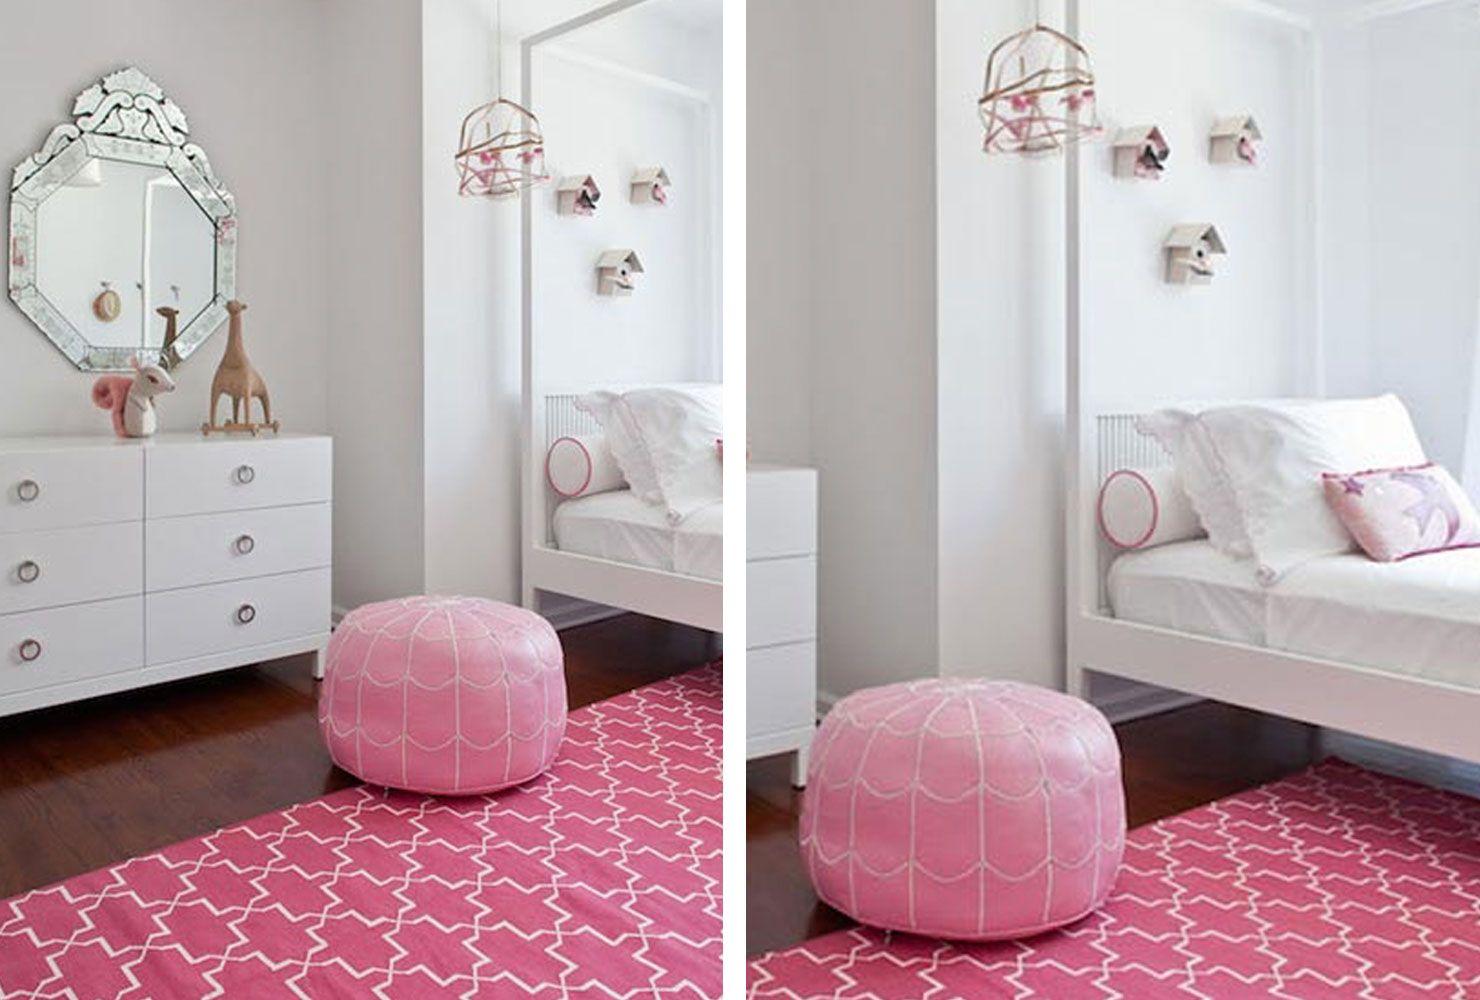 Idea by Danielle on Pink Rose Cottage   Rose cottage